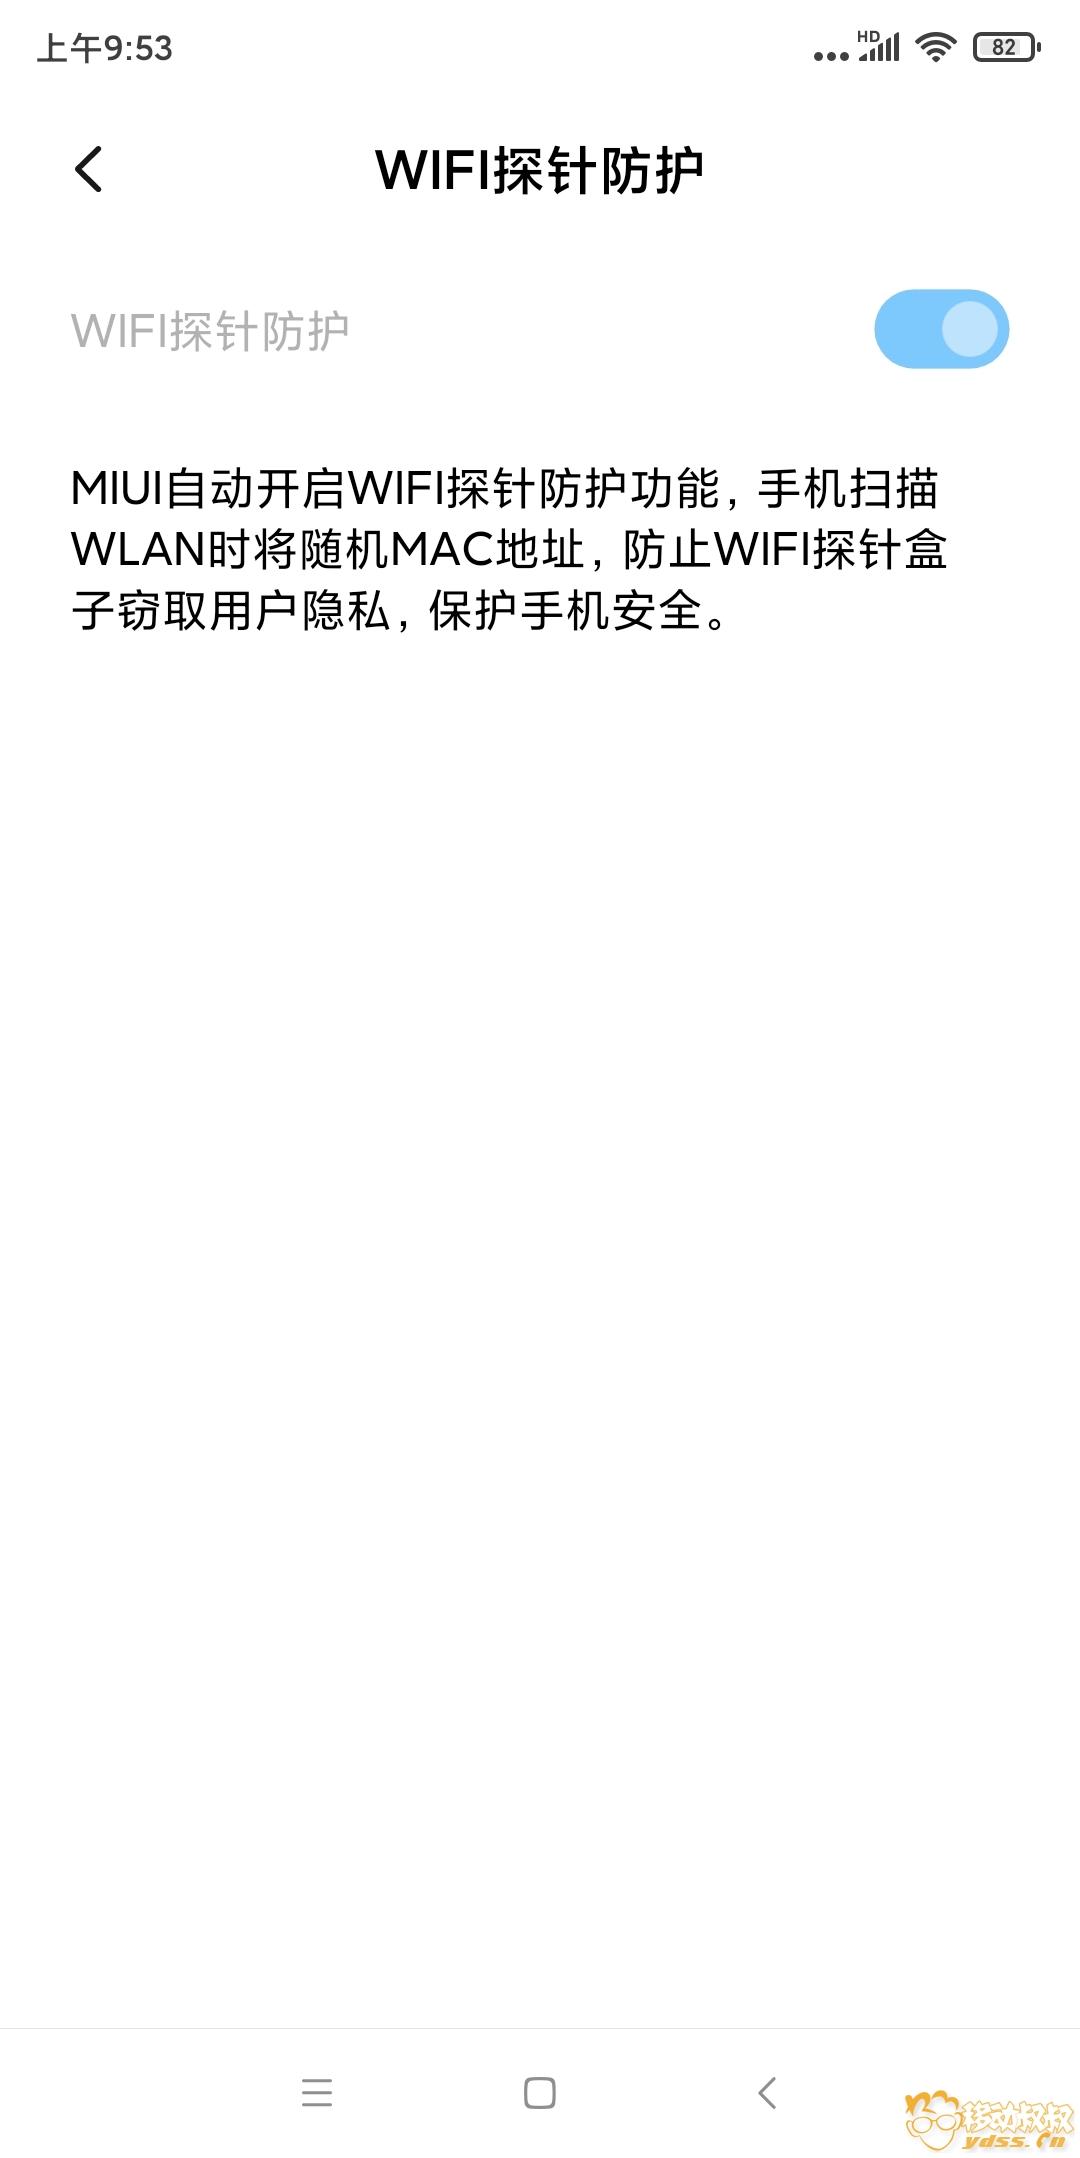 Screenshot_2019-11-06-09-53-05-574_com.android.settings.jpg